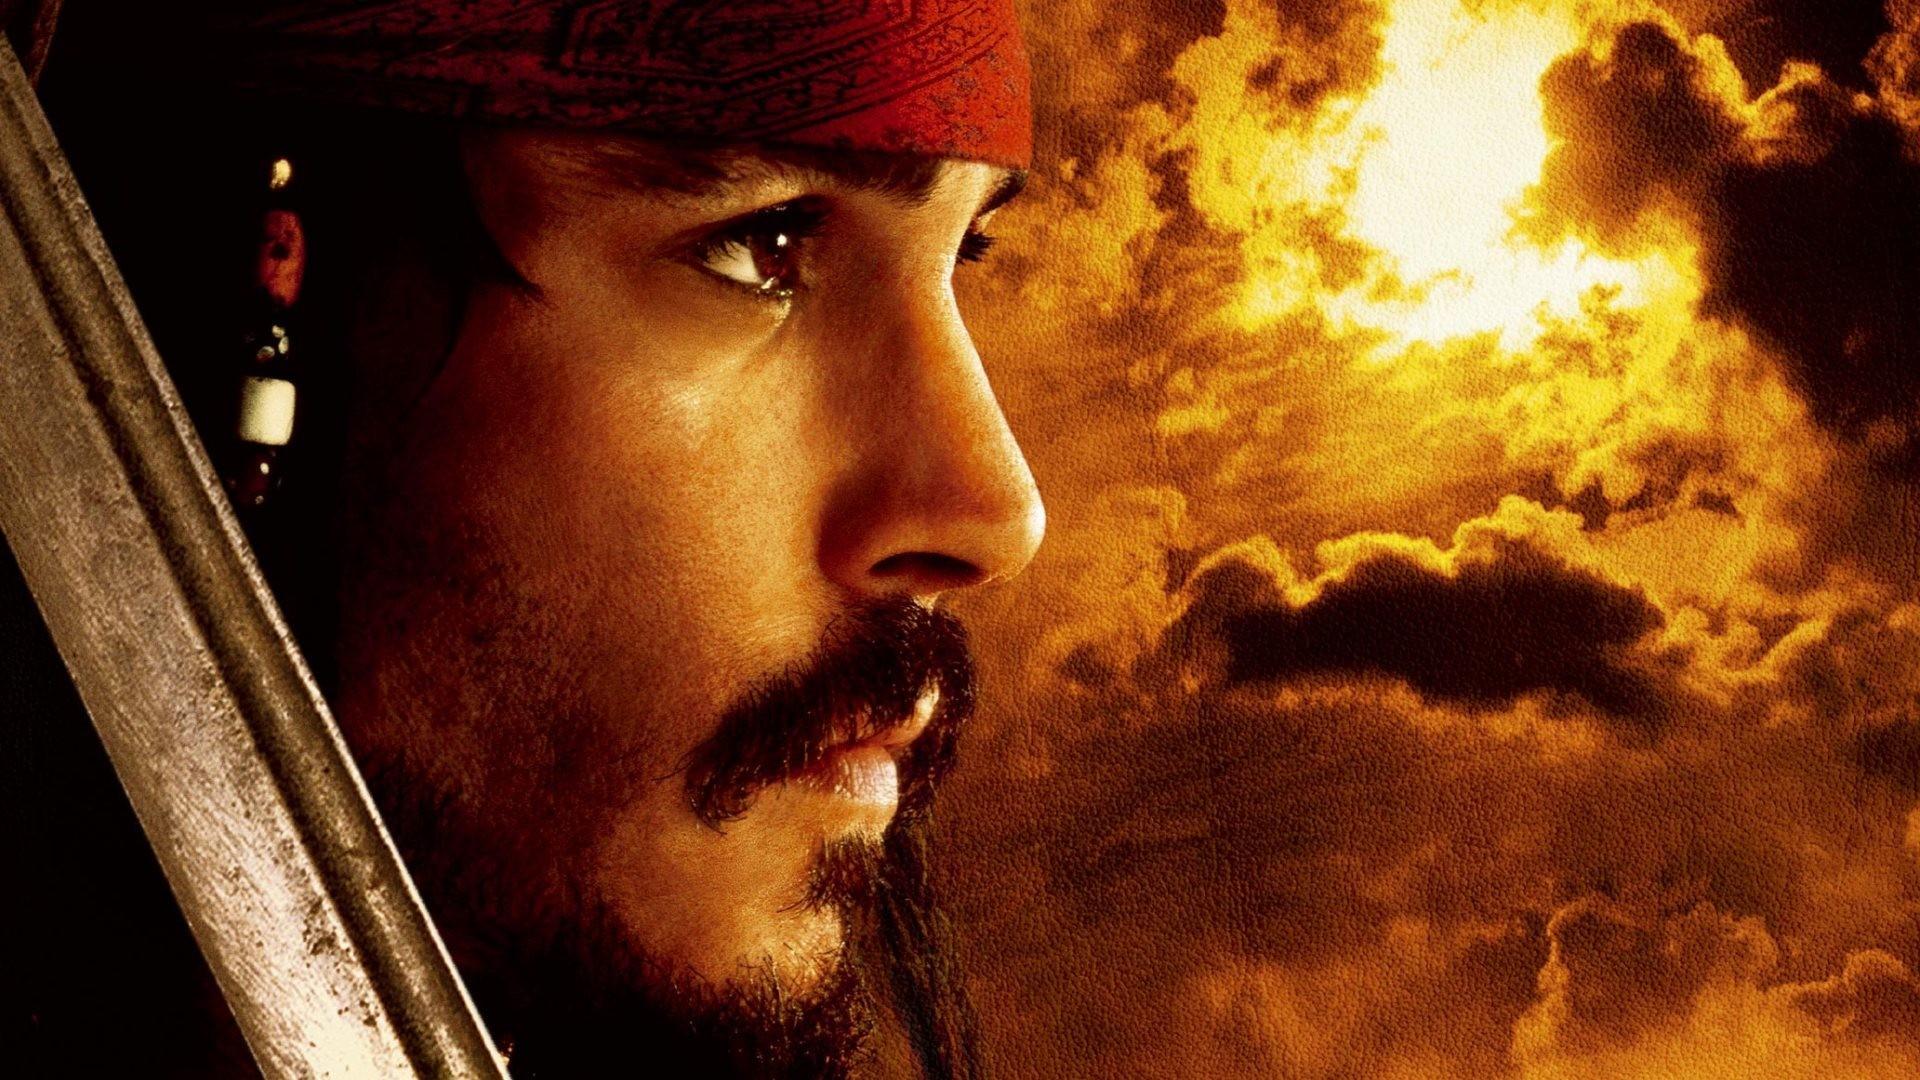 Piratas Do Caribe A Maldicao Do Perola Negra Papel De Parede Hd